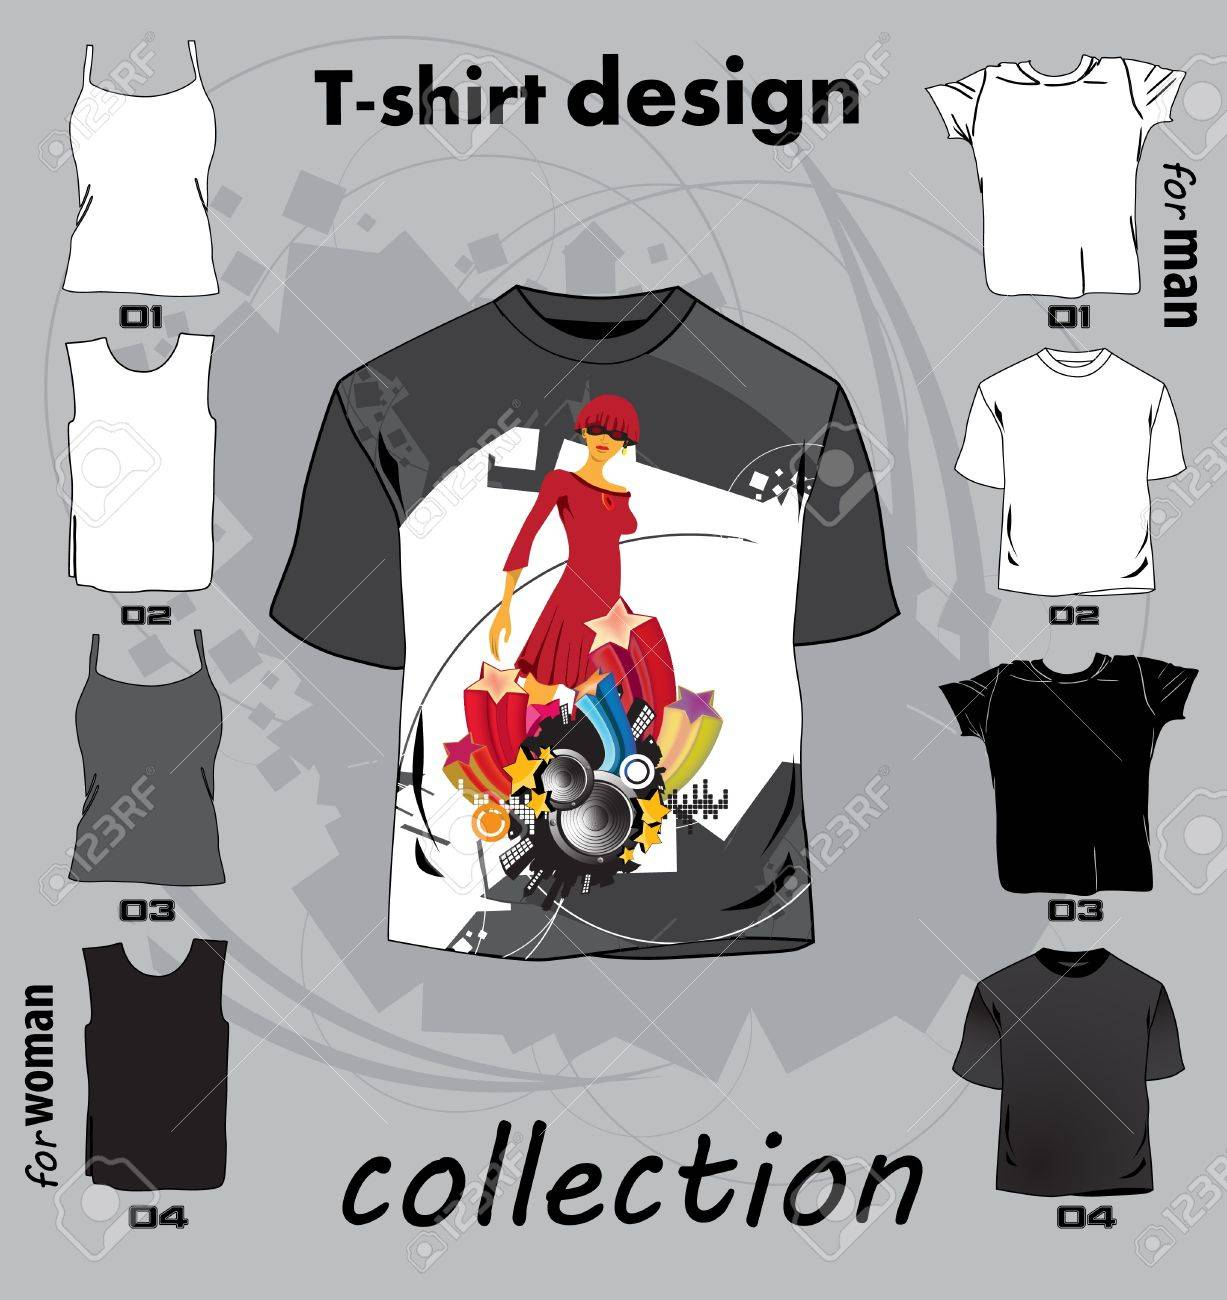 T shirt design vector - Abstract T Shirt Design Vector Illustration Stock Vector 17478251